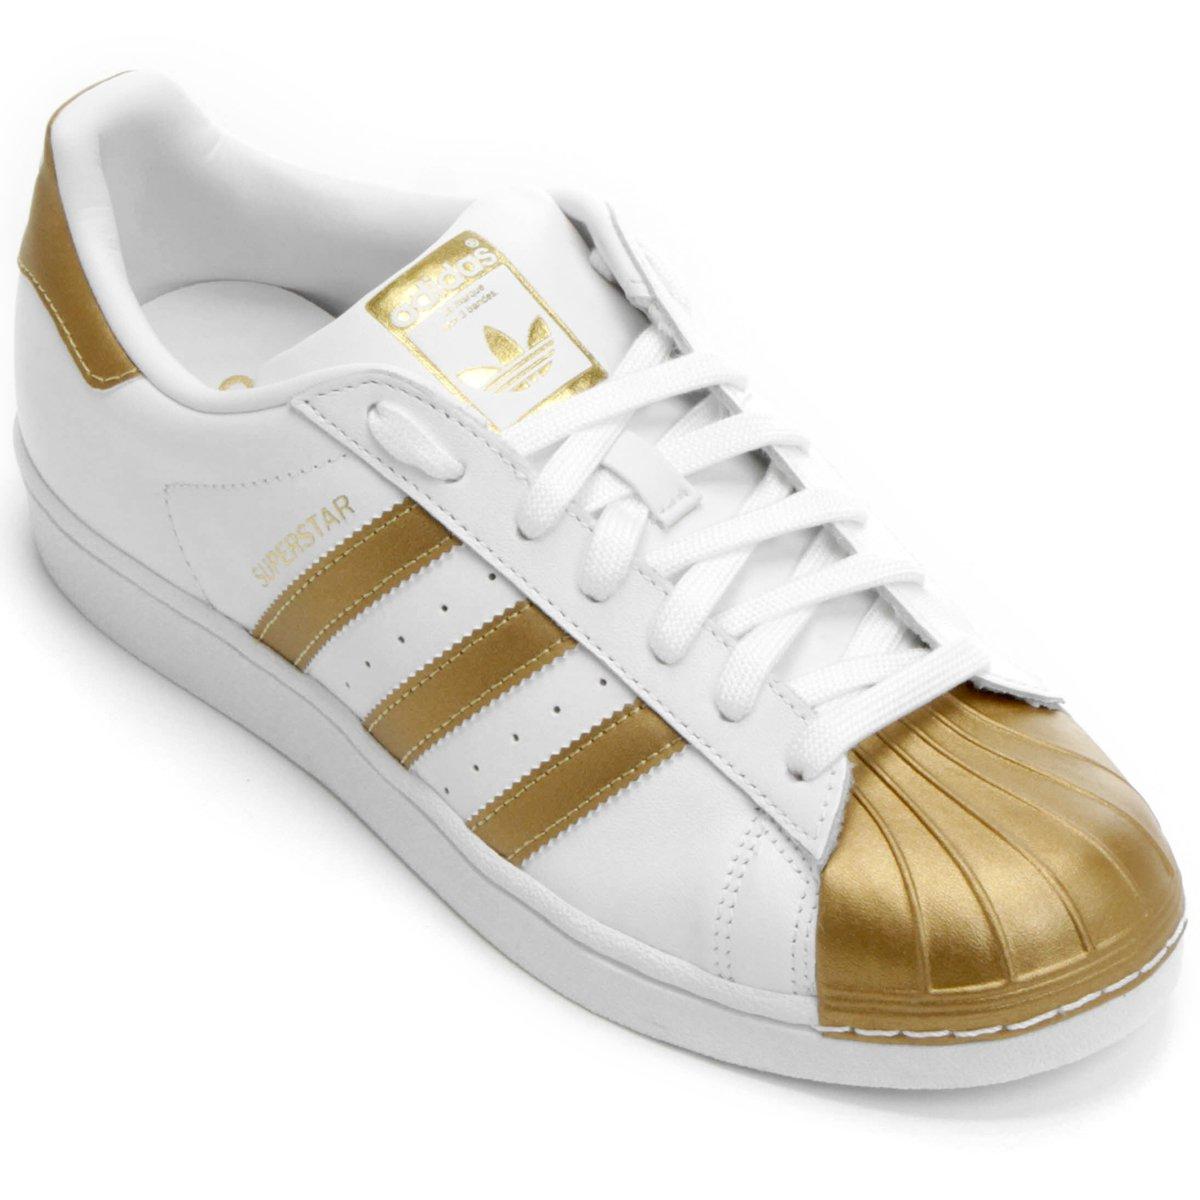 93ad99fb2ffa5 Tênis Adidas Superstar Metallic - Compre Agora   Netshoes